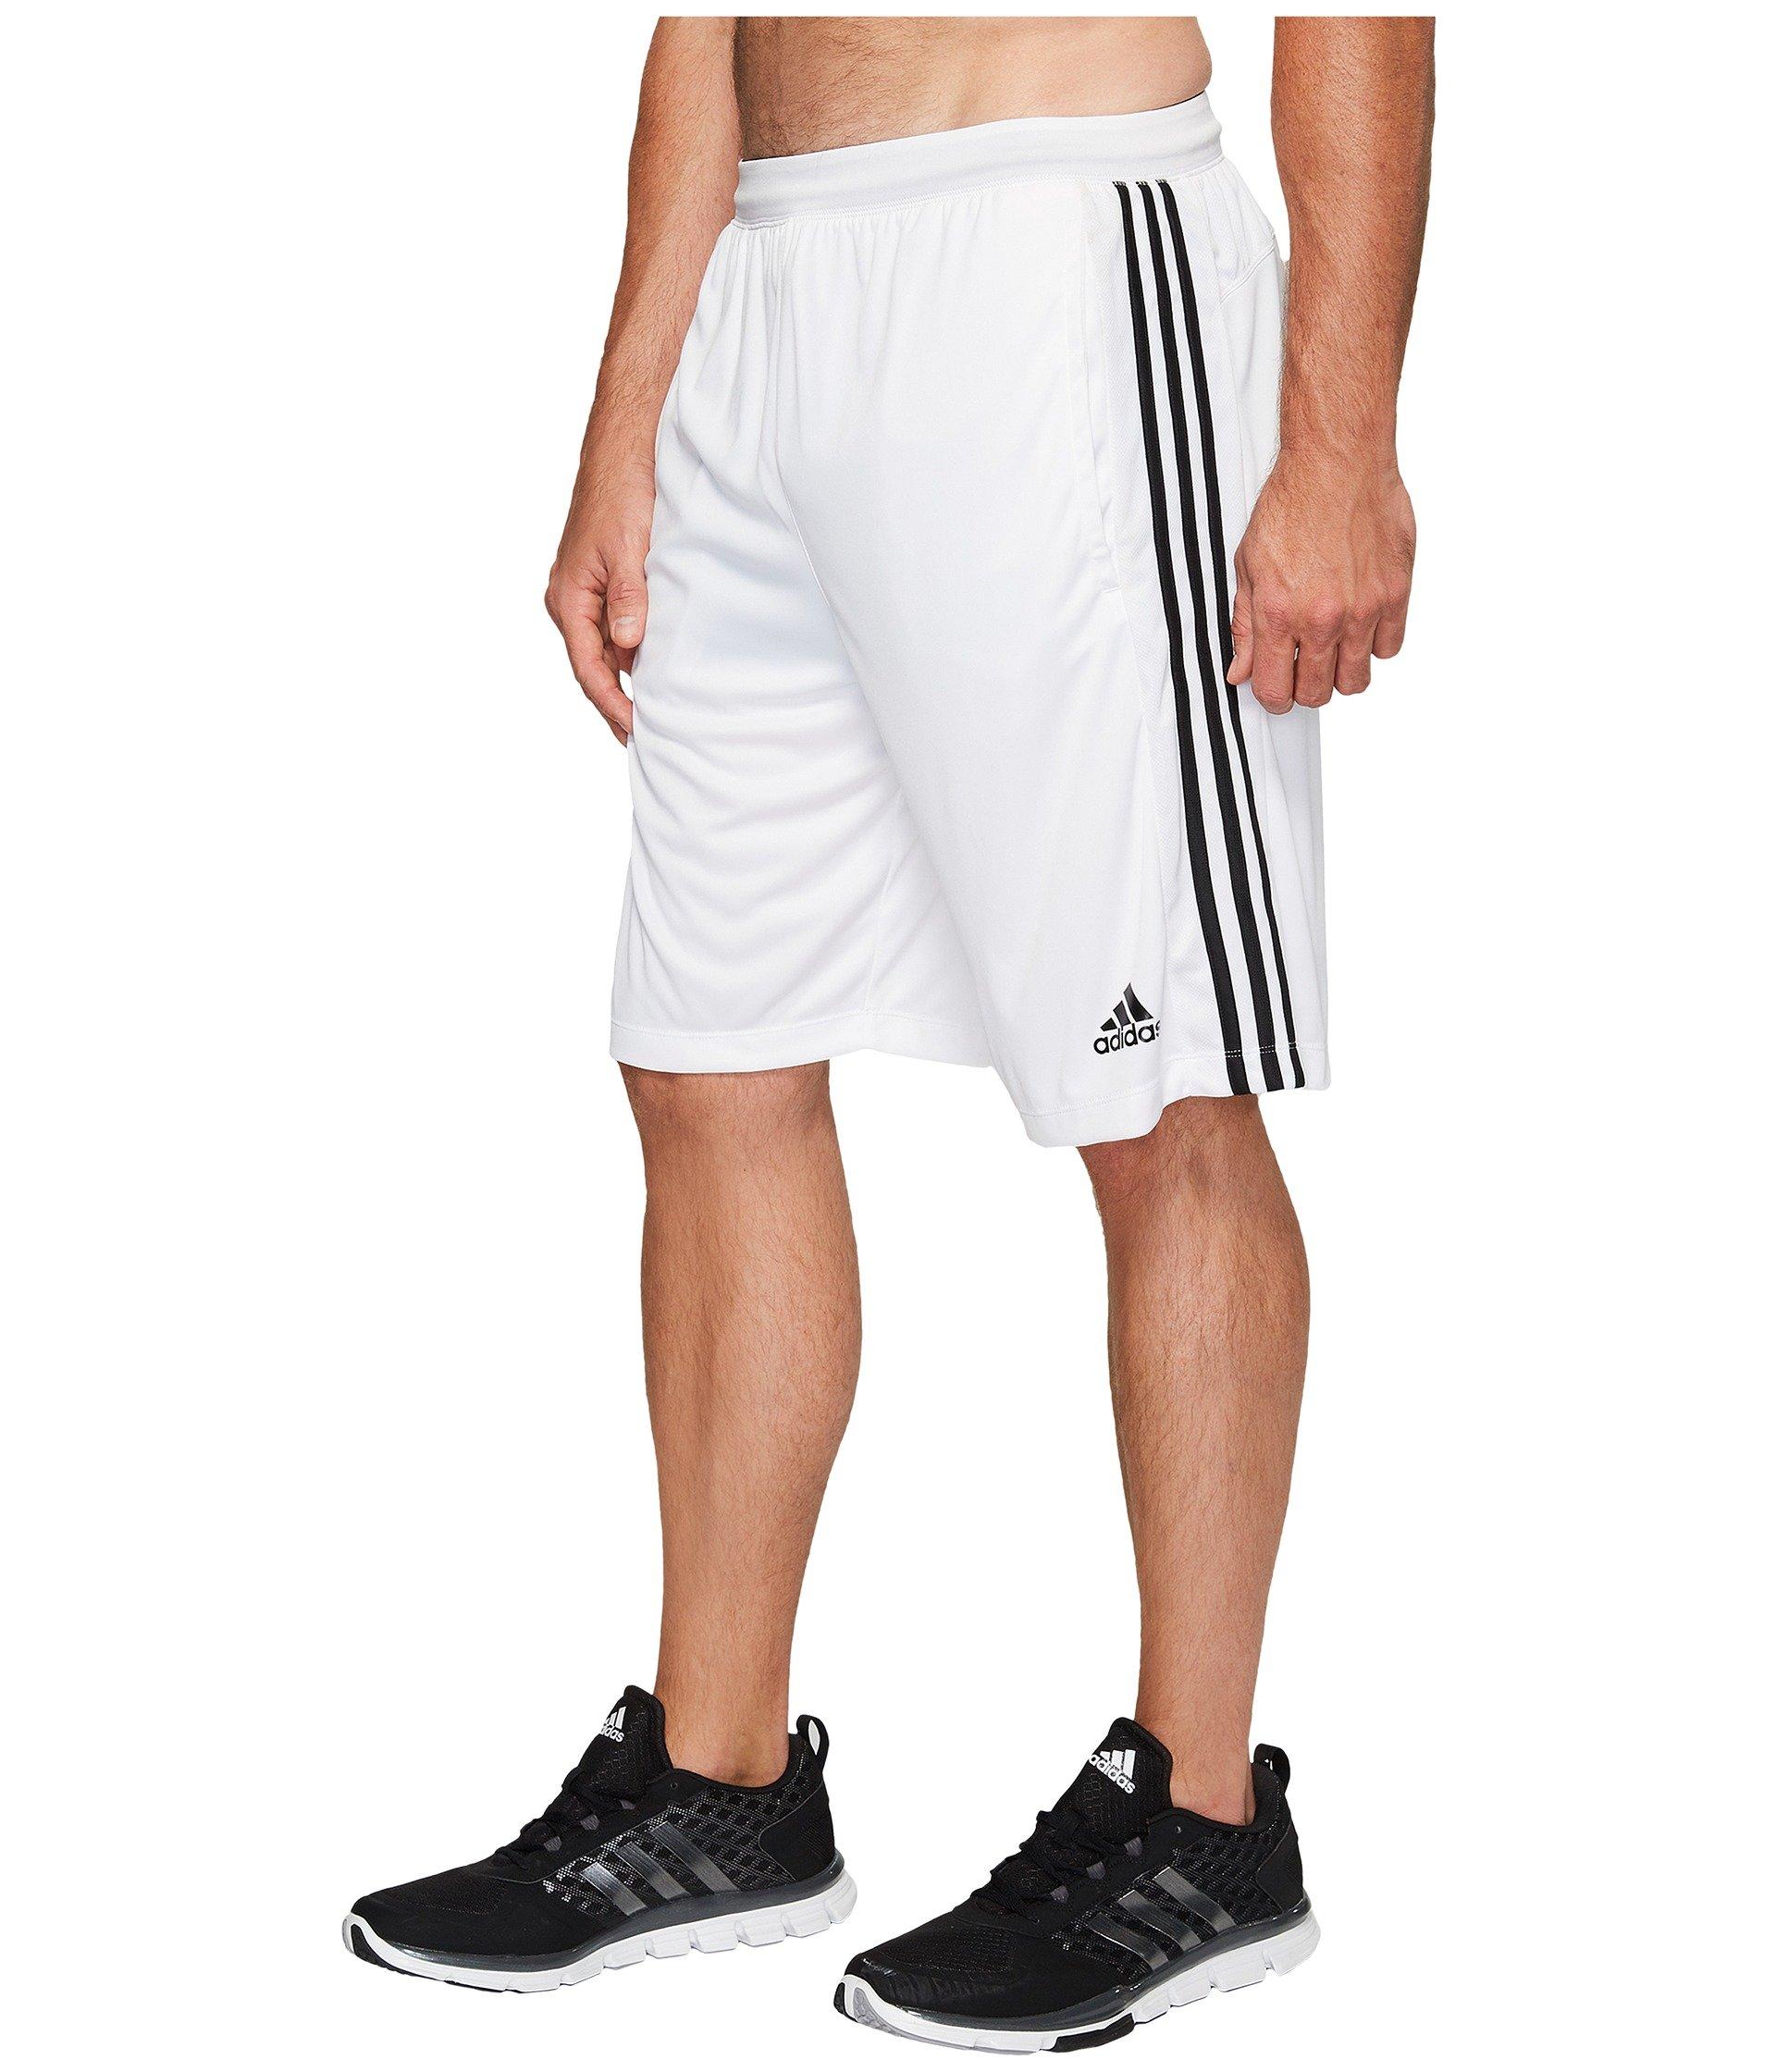 adidas Men's Big & Tall Designed-2-Move 3-Stripes